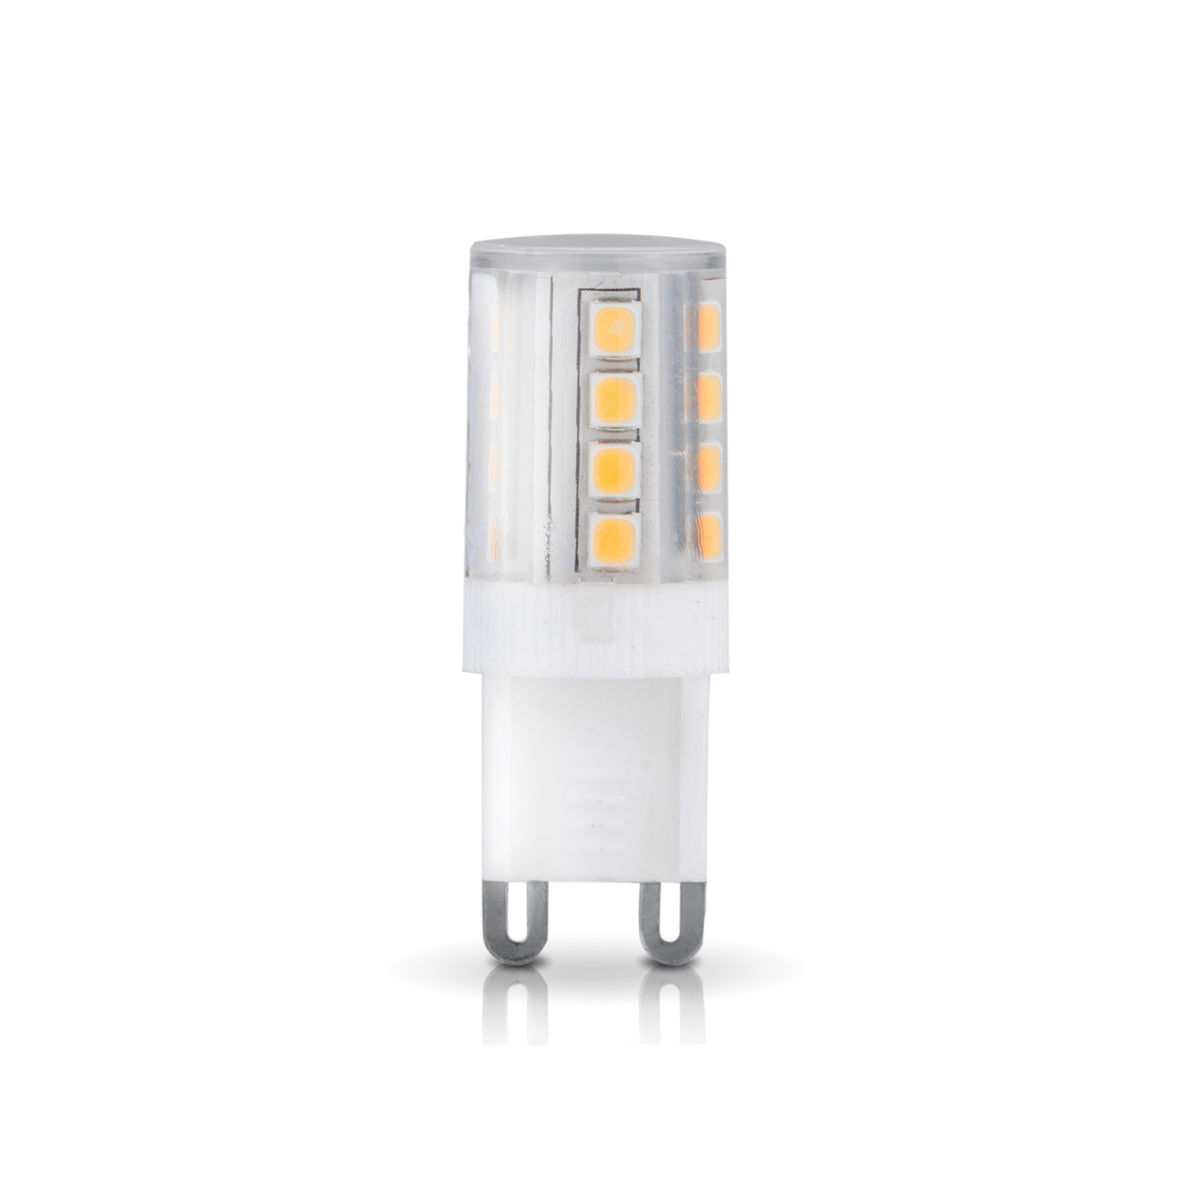 Wofi PRISMA Pendellampe LED Chrom, 1-flammig